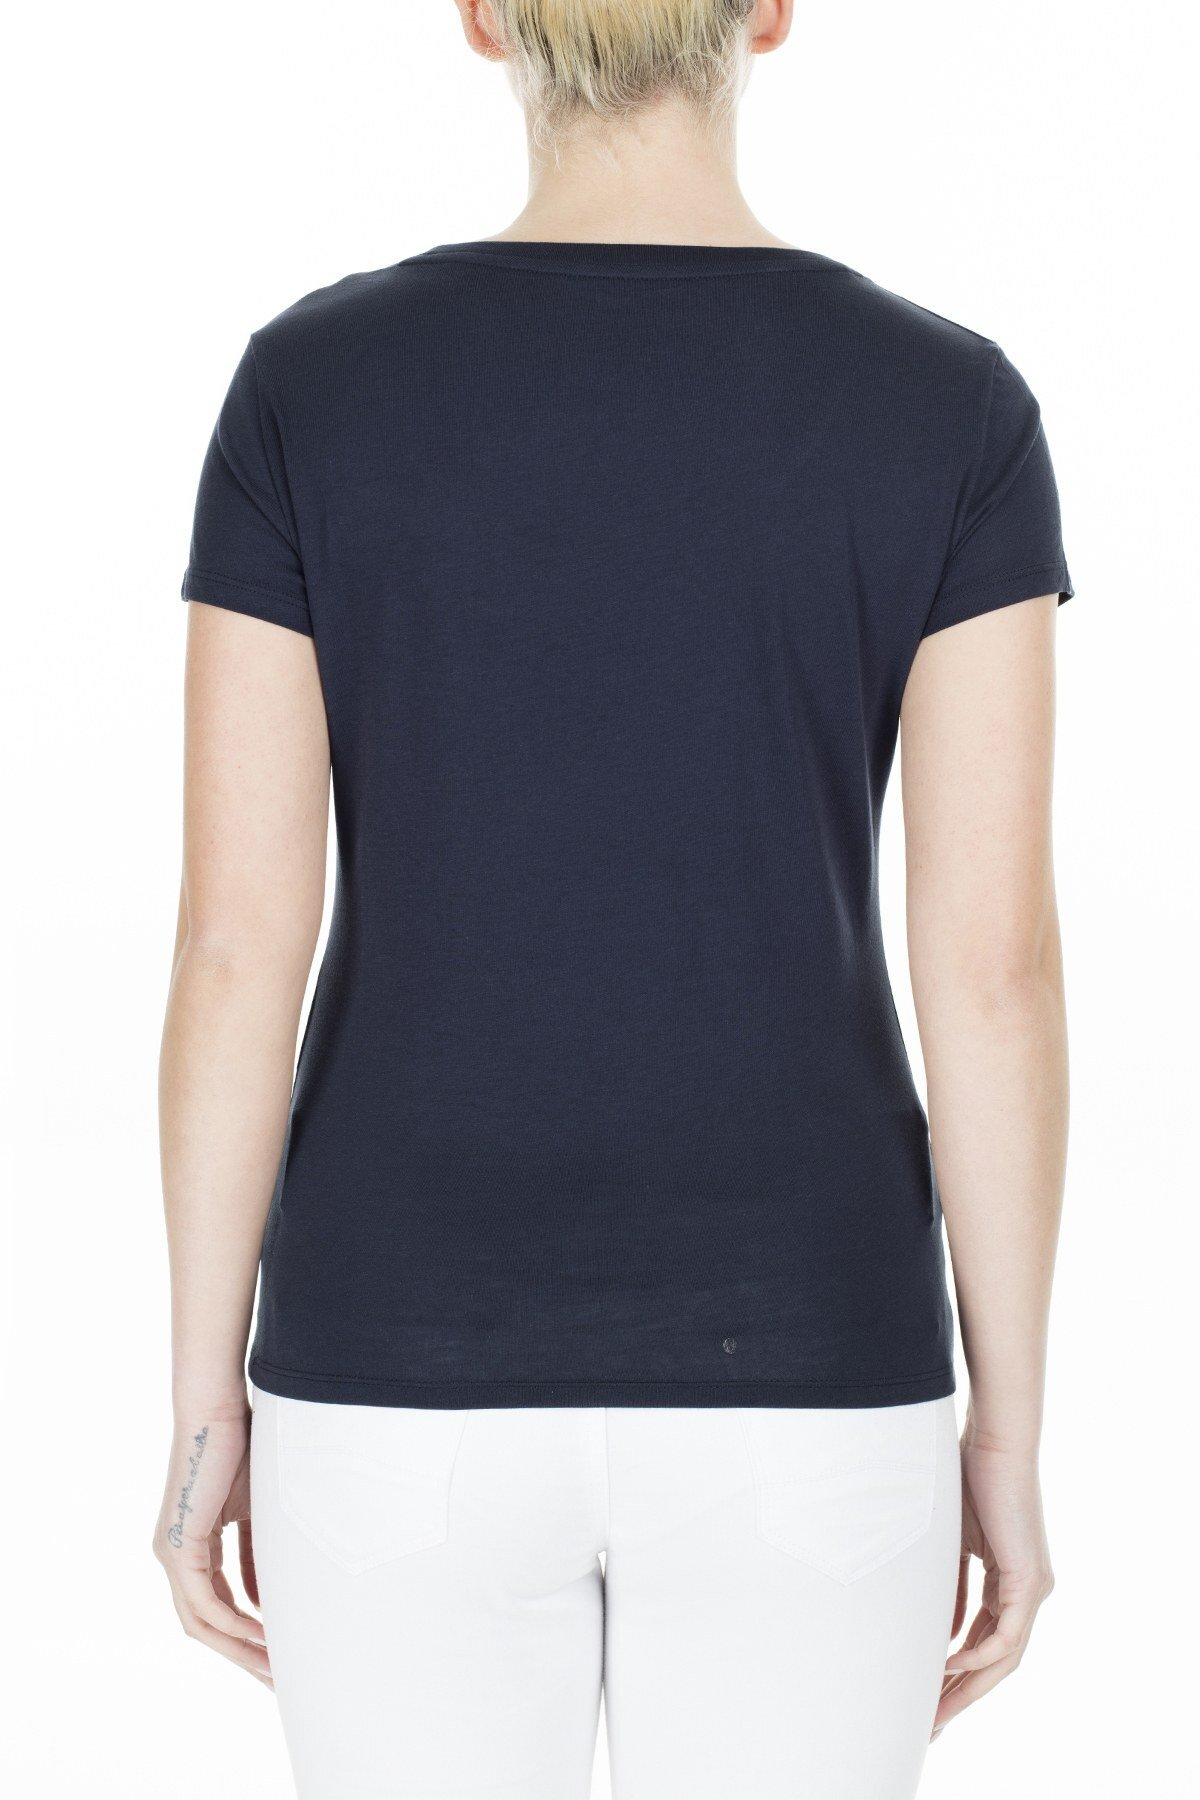 Armani Exchange Kadın T Shirt 8NYT83 YJ16Z 1510 LACİVERT